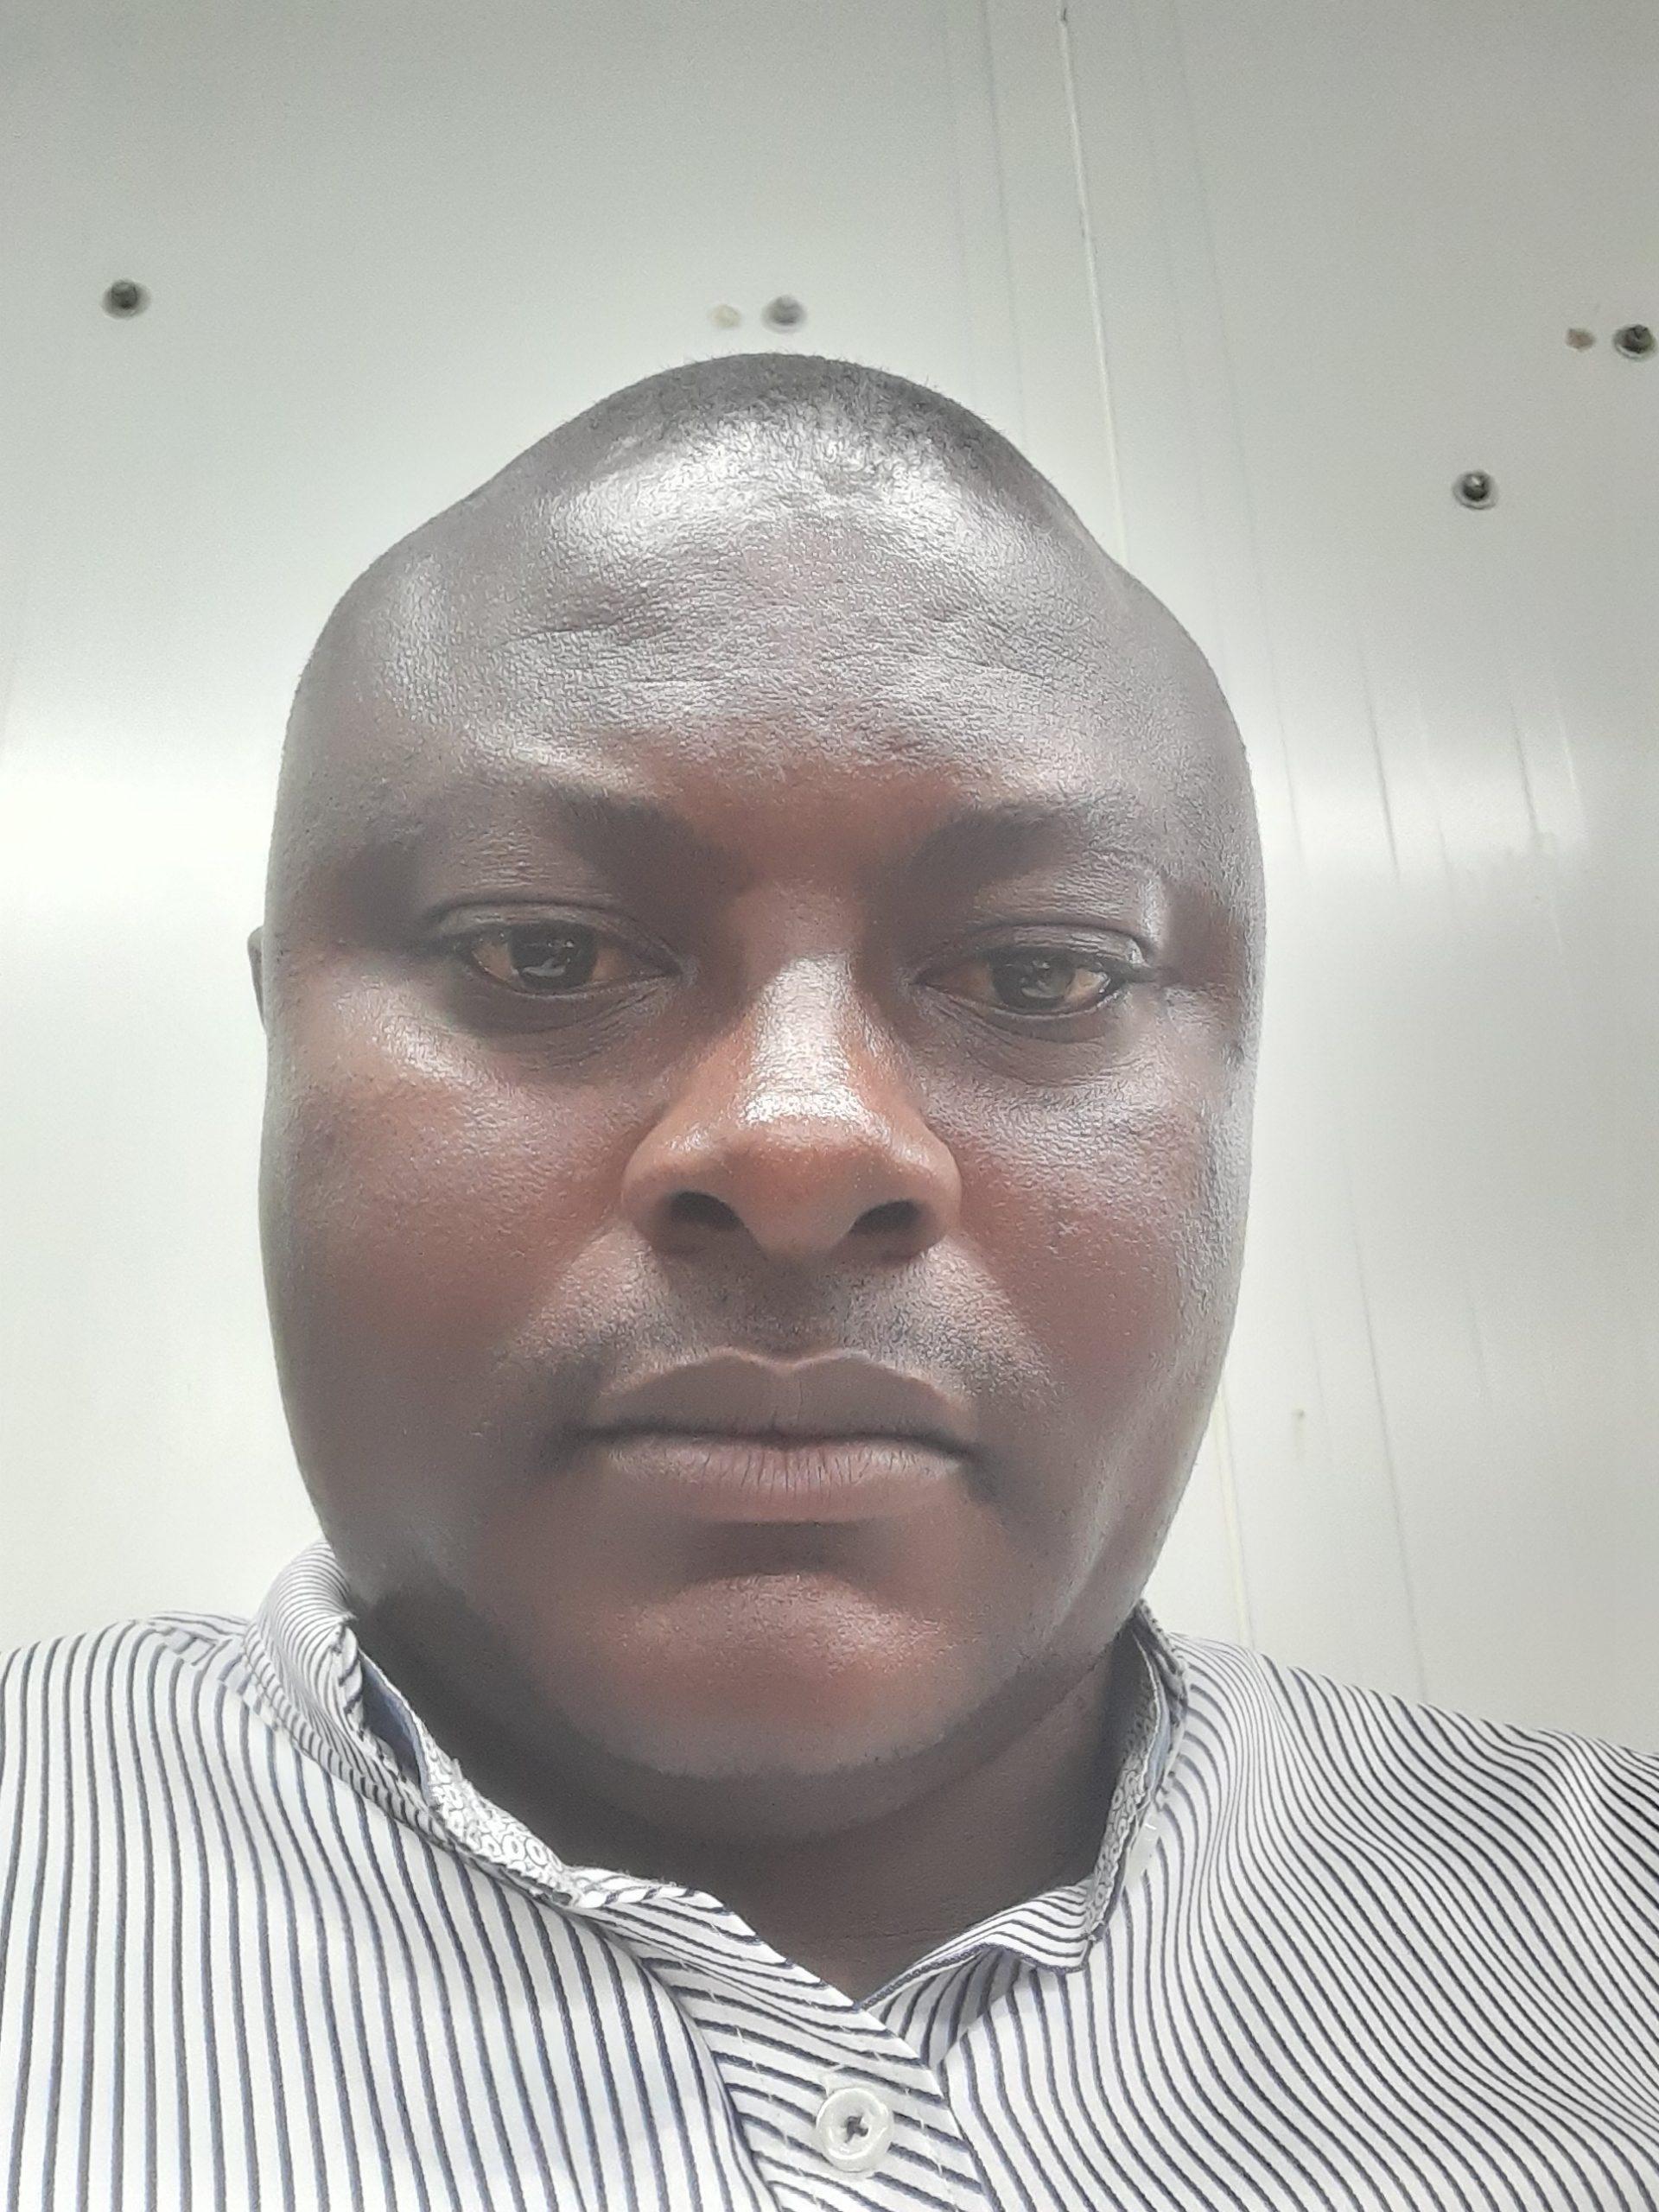 Yomtox Nig Ltd, Ayodele Ajayi, Lagos, Nigeria